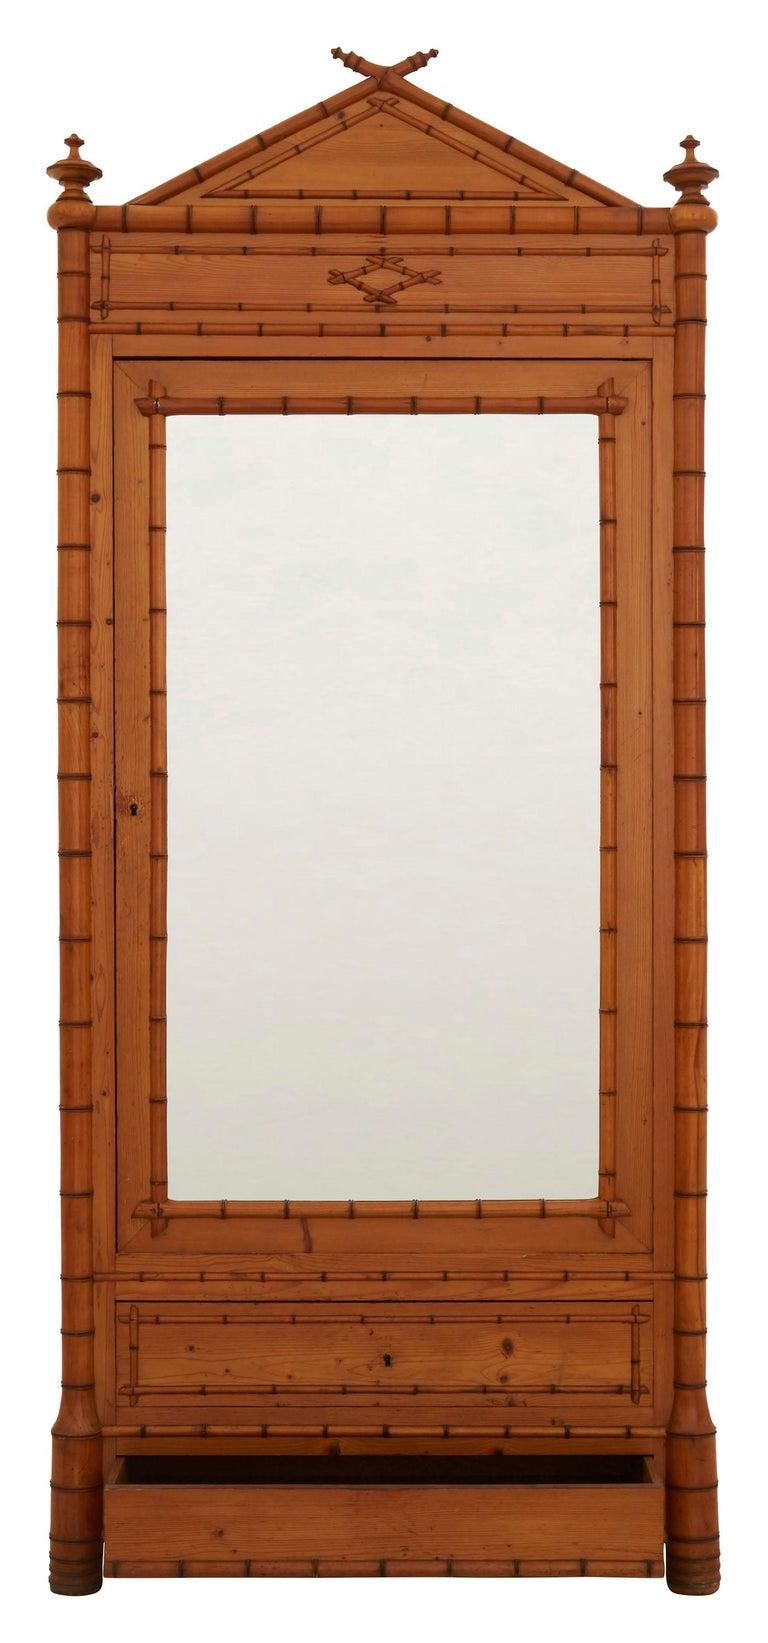 • Original mirror • Wood faux bamboo • Early 20th century • Paris • Measures: 39.5